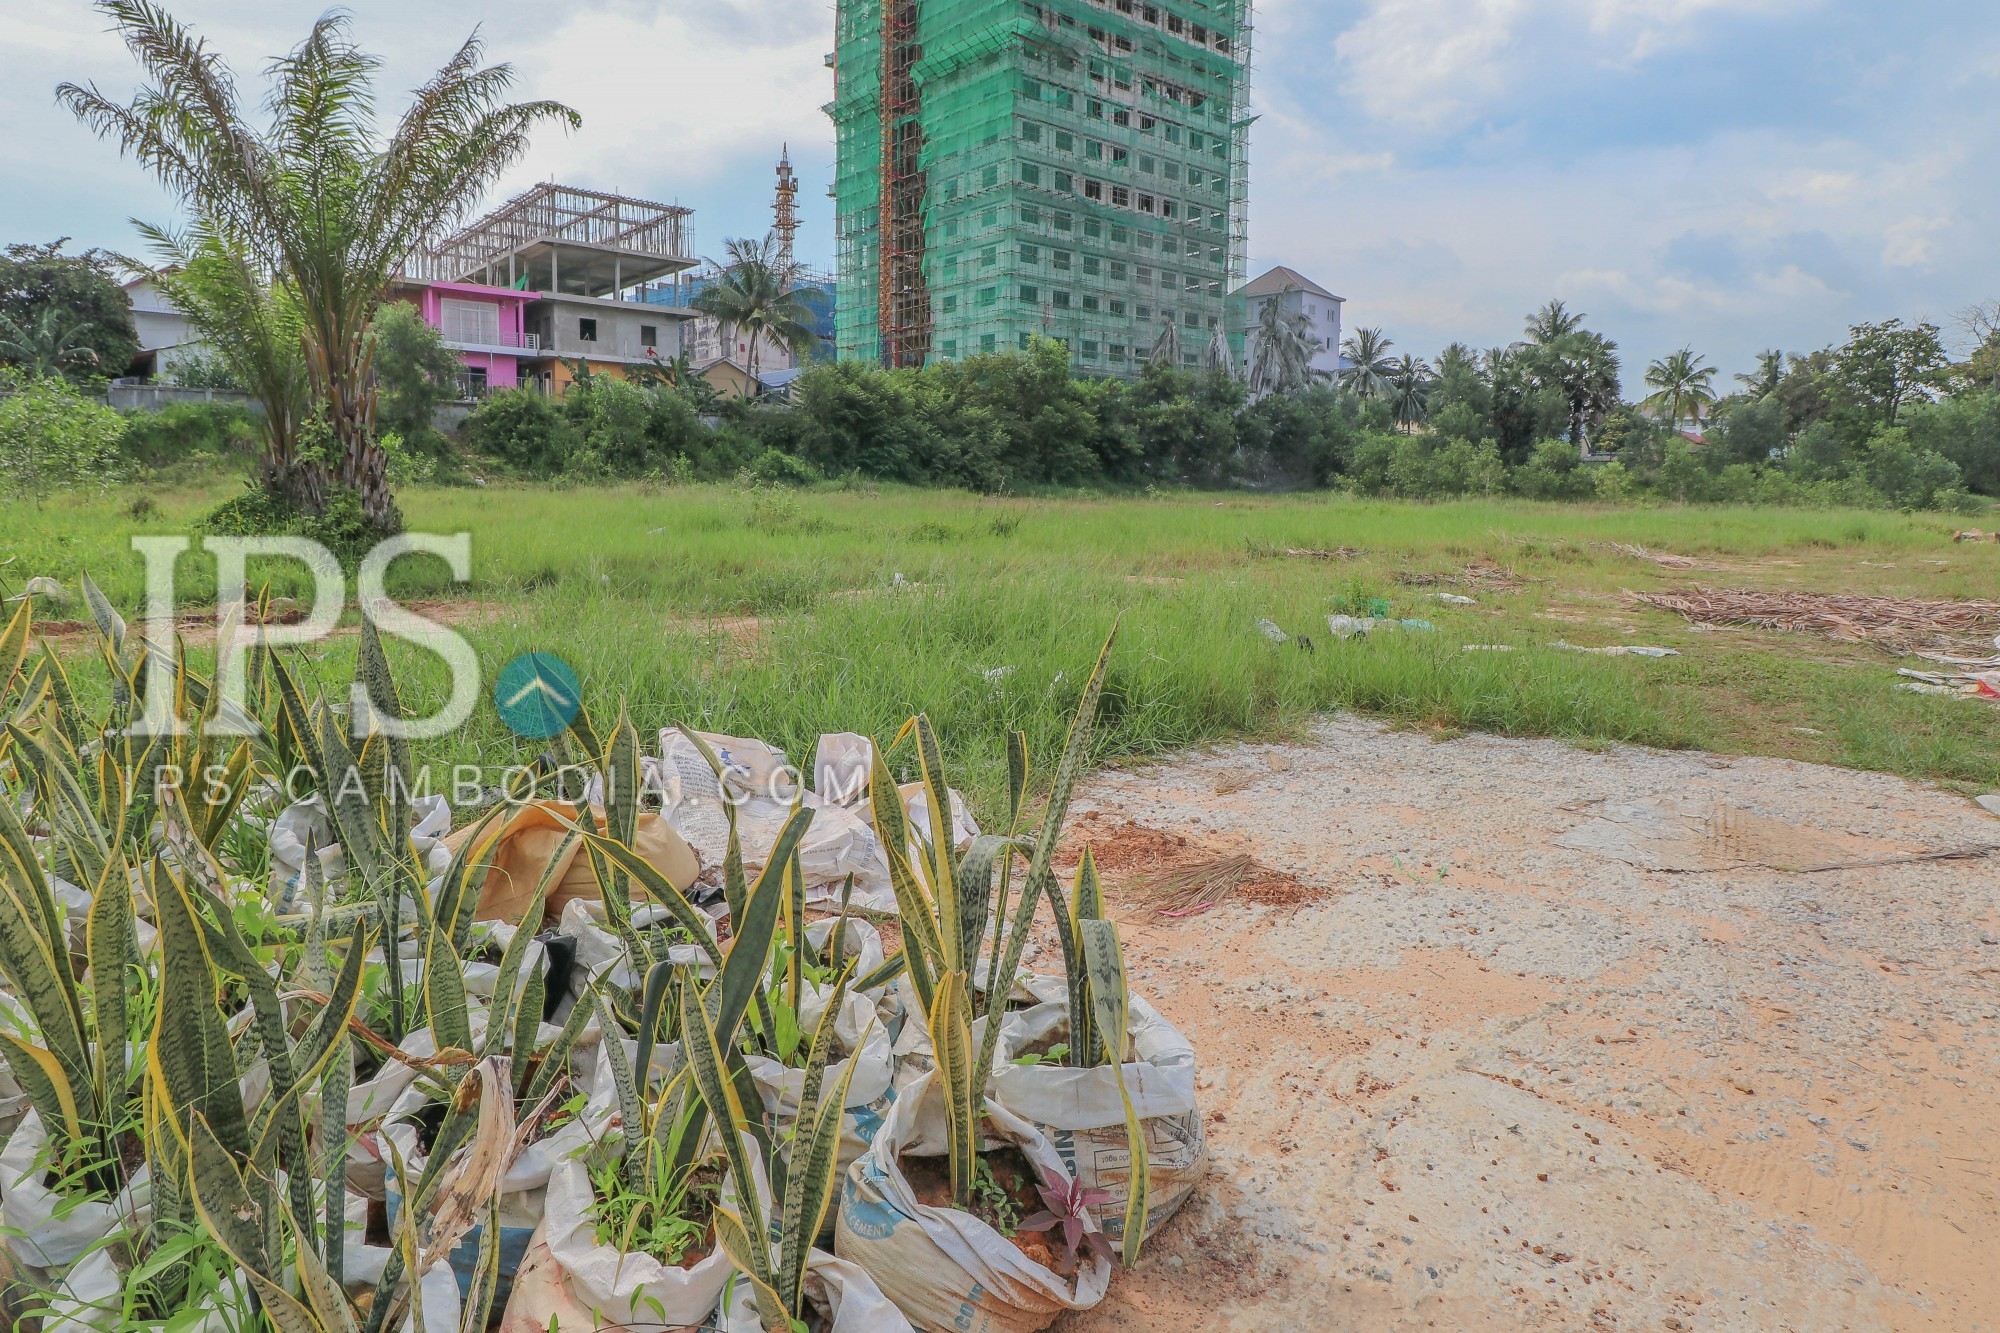 21,080sqm Land For Rent - Sihanoukville, Kouch Asai Area,